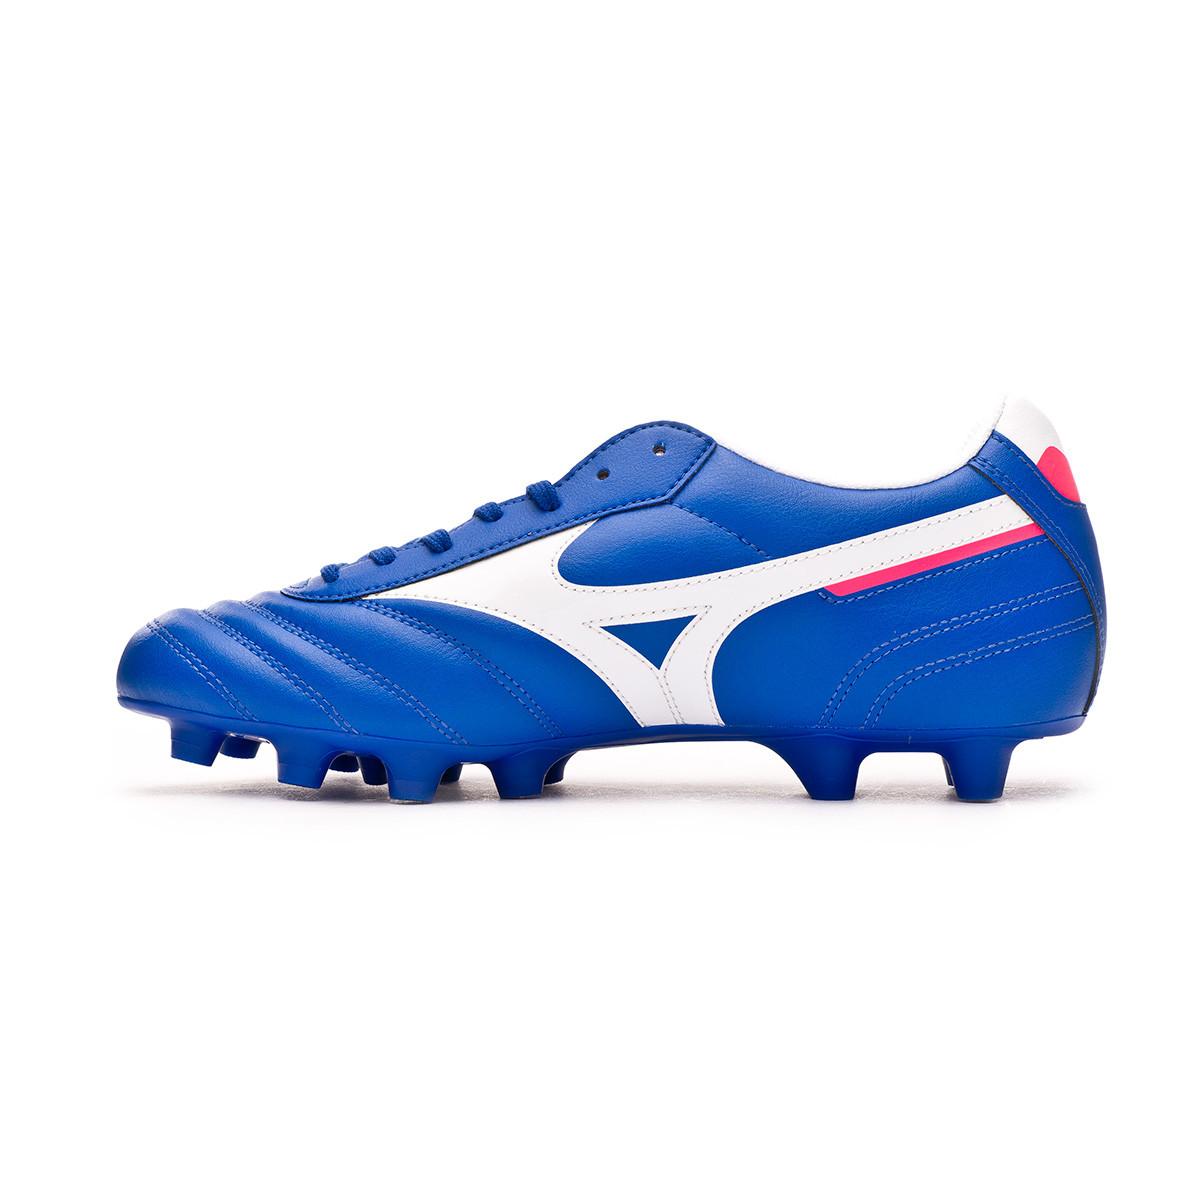 Chaussures de Football Mixte Mizuno Morelia II Club